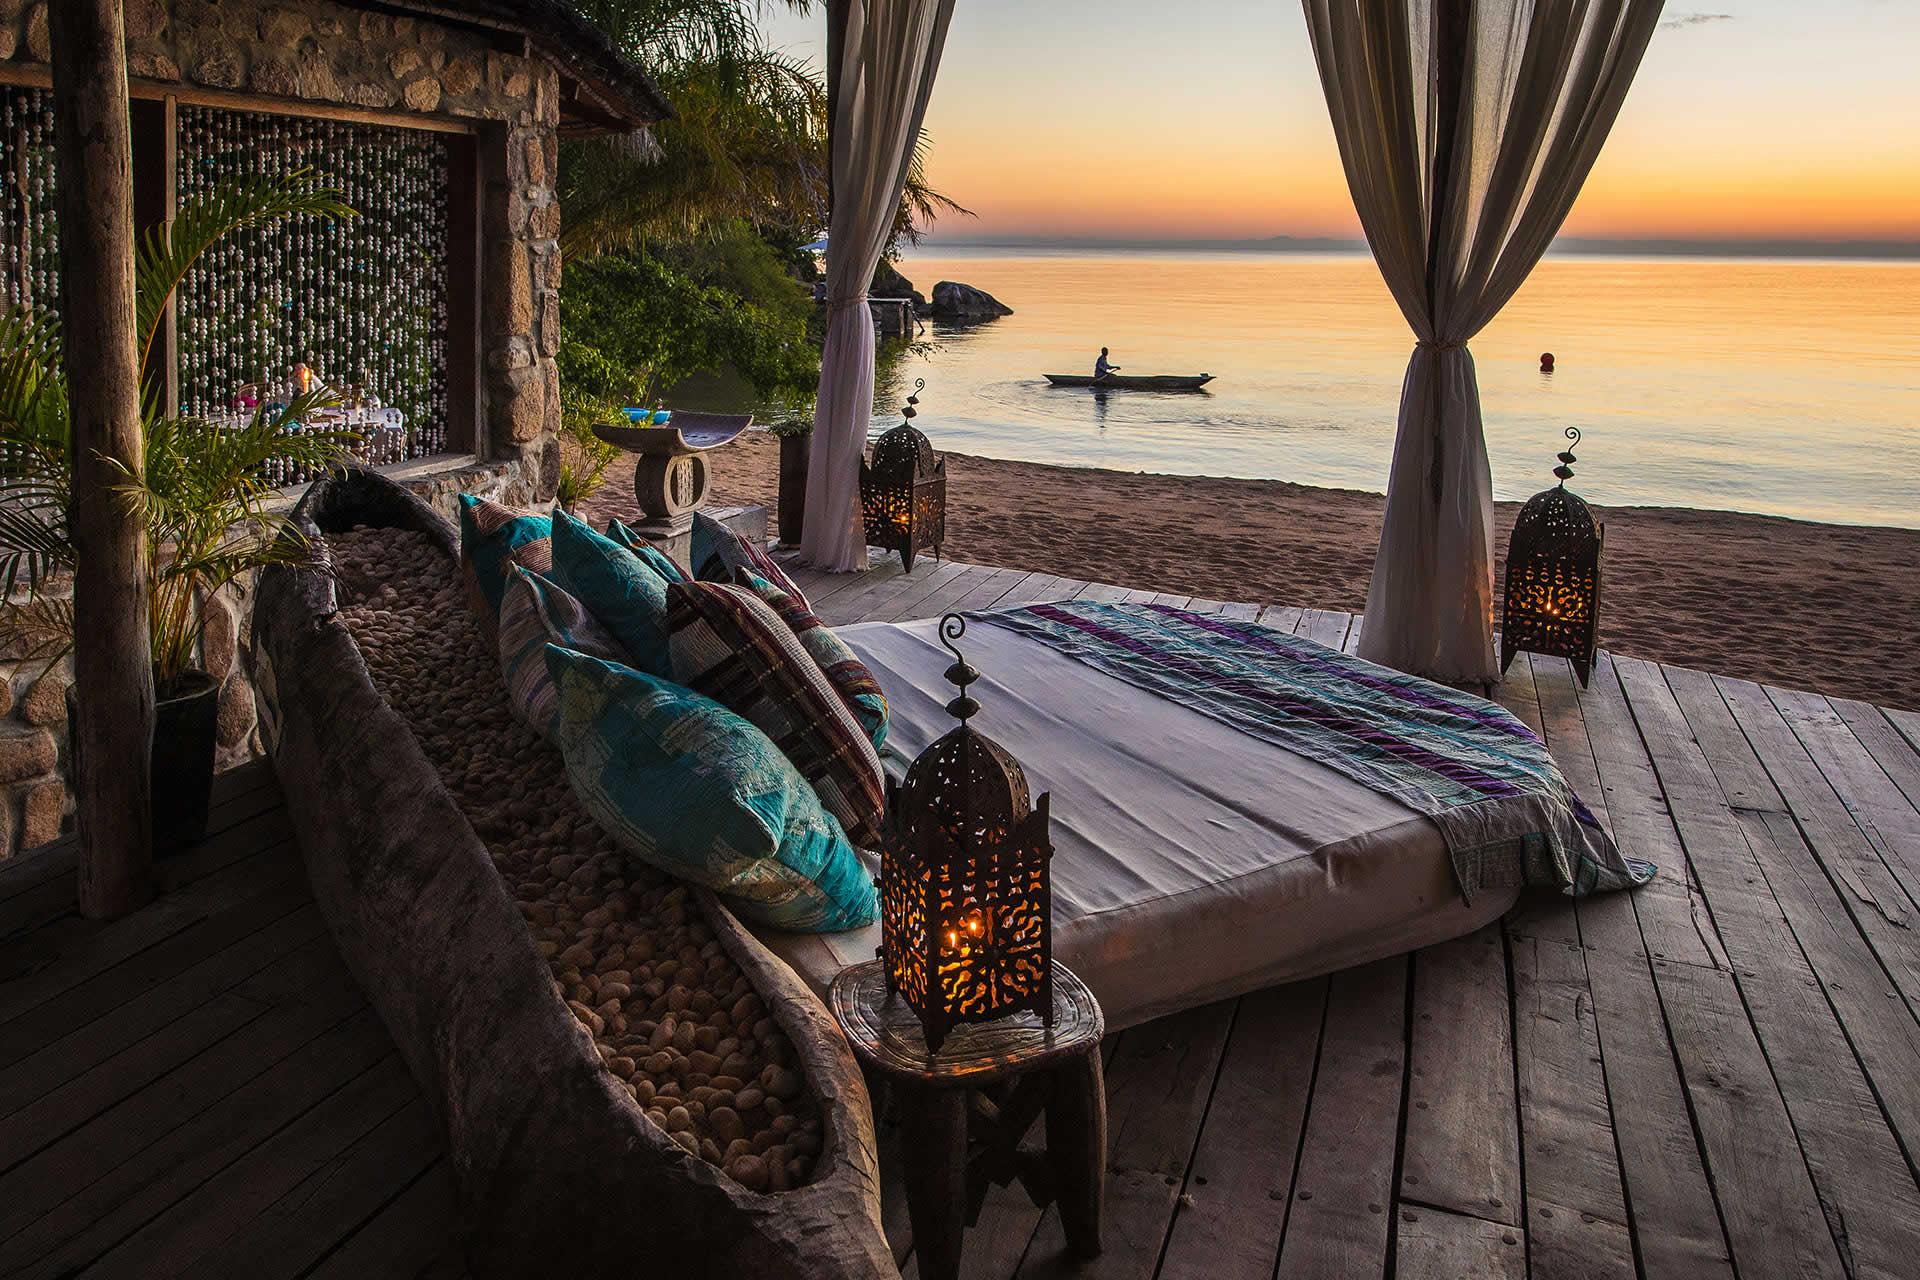 Sunset on Lake Malawi, Kaya Mawa